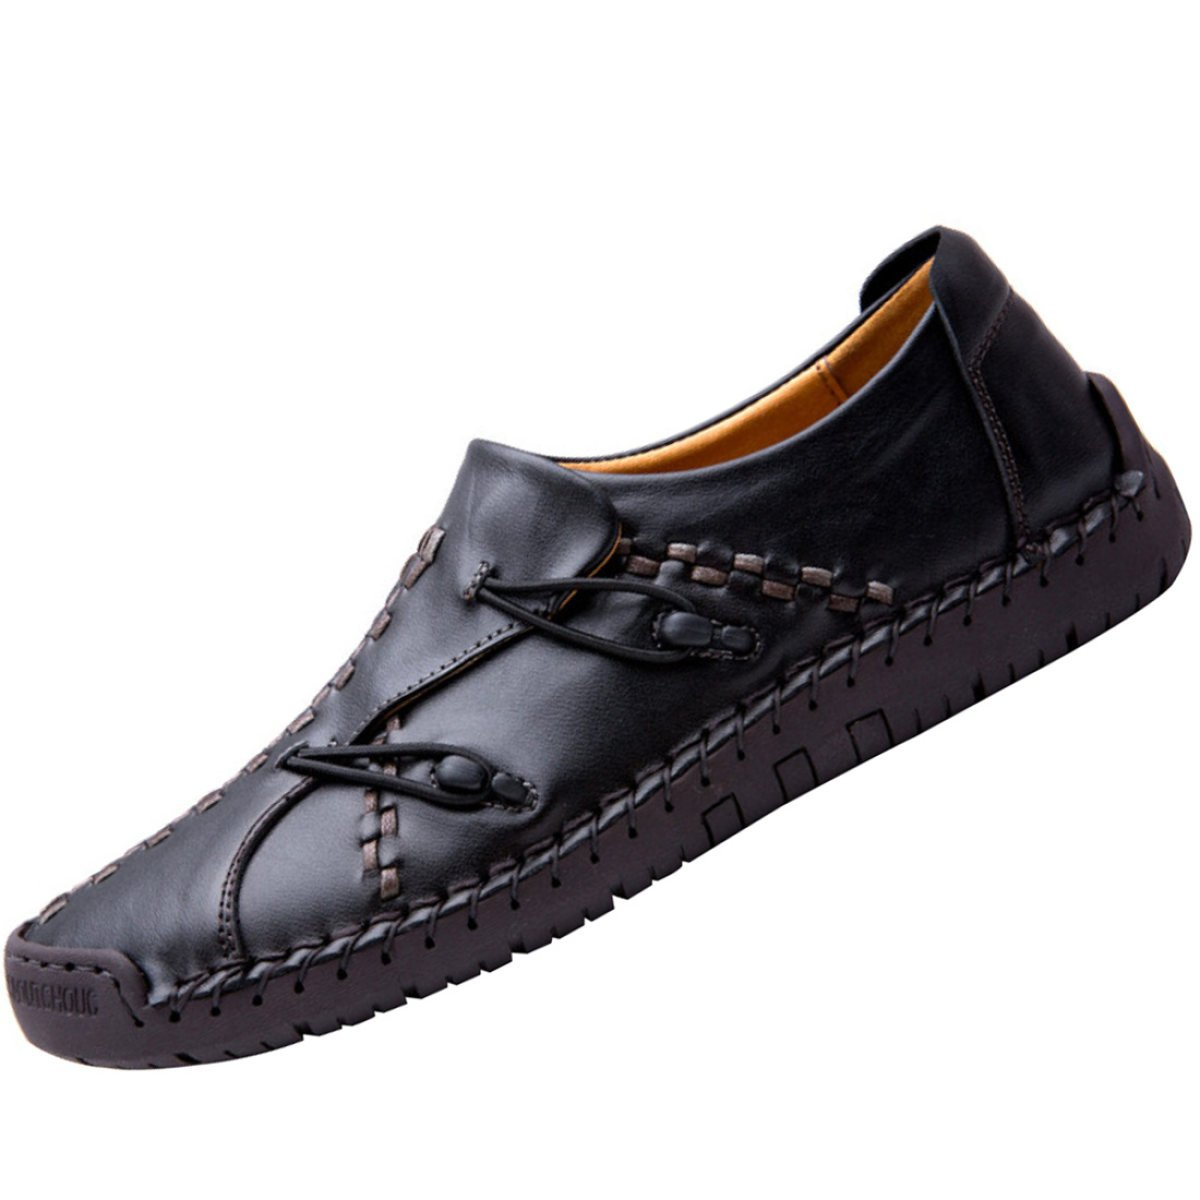 MYXUA Herren Leder Mode Handgefertigte Leder Nähte Schuhe Wild Bequeme Schuhe